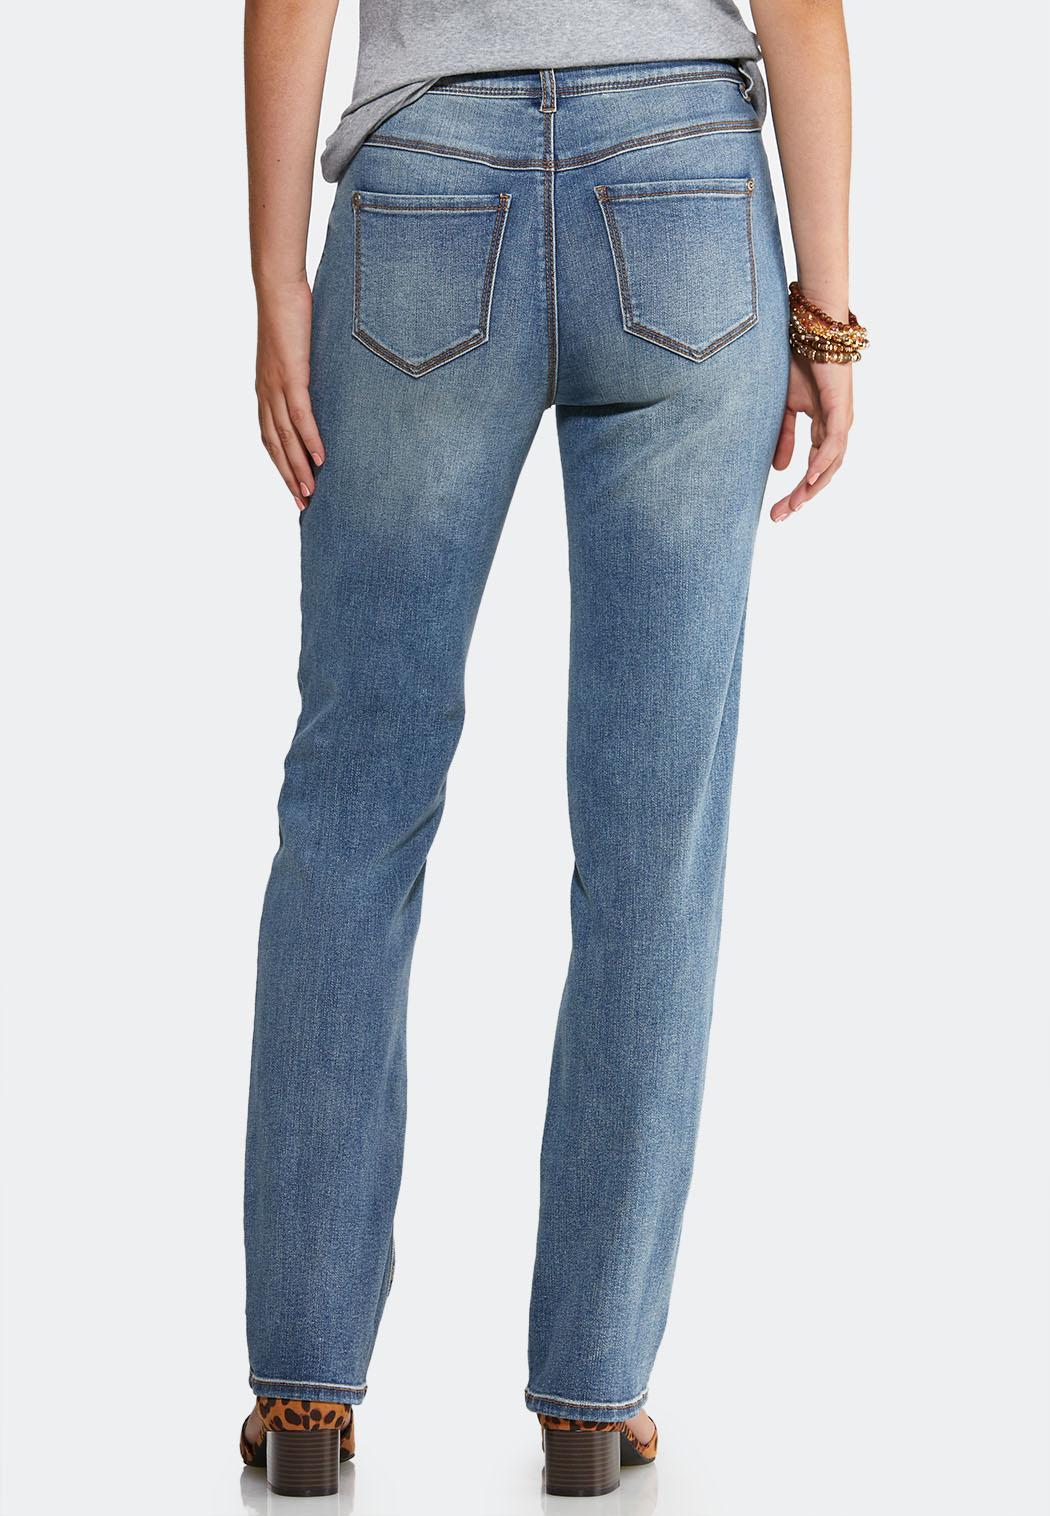 Medium Wash Straight Leg Jeans (Item #43992008)